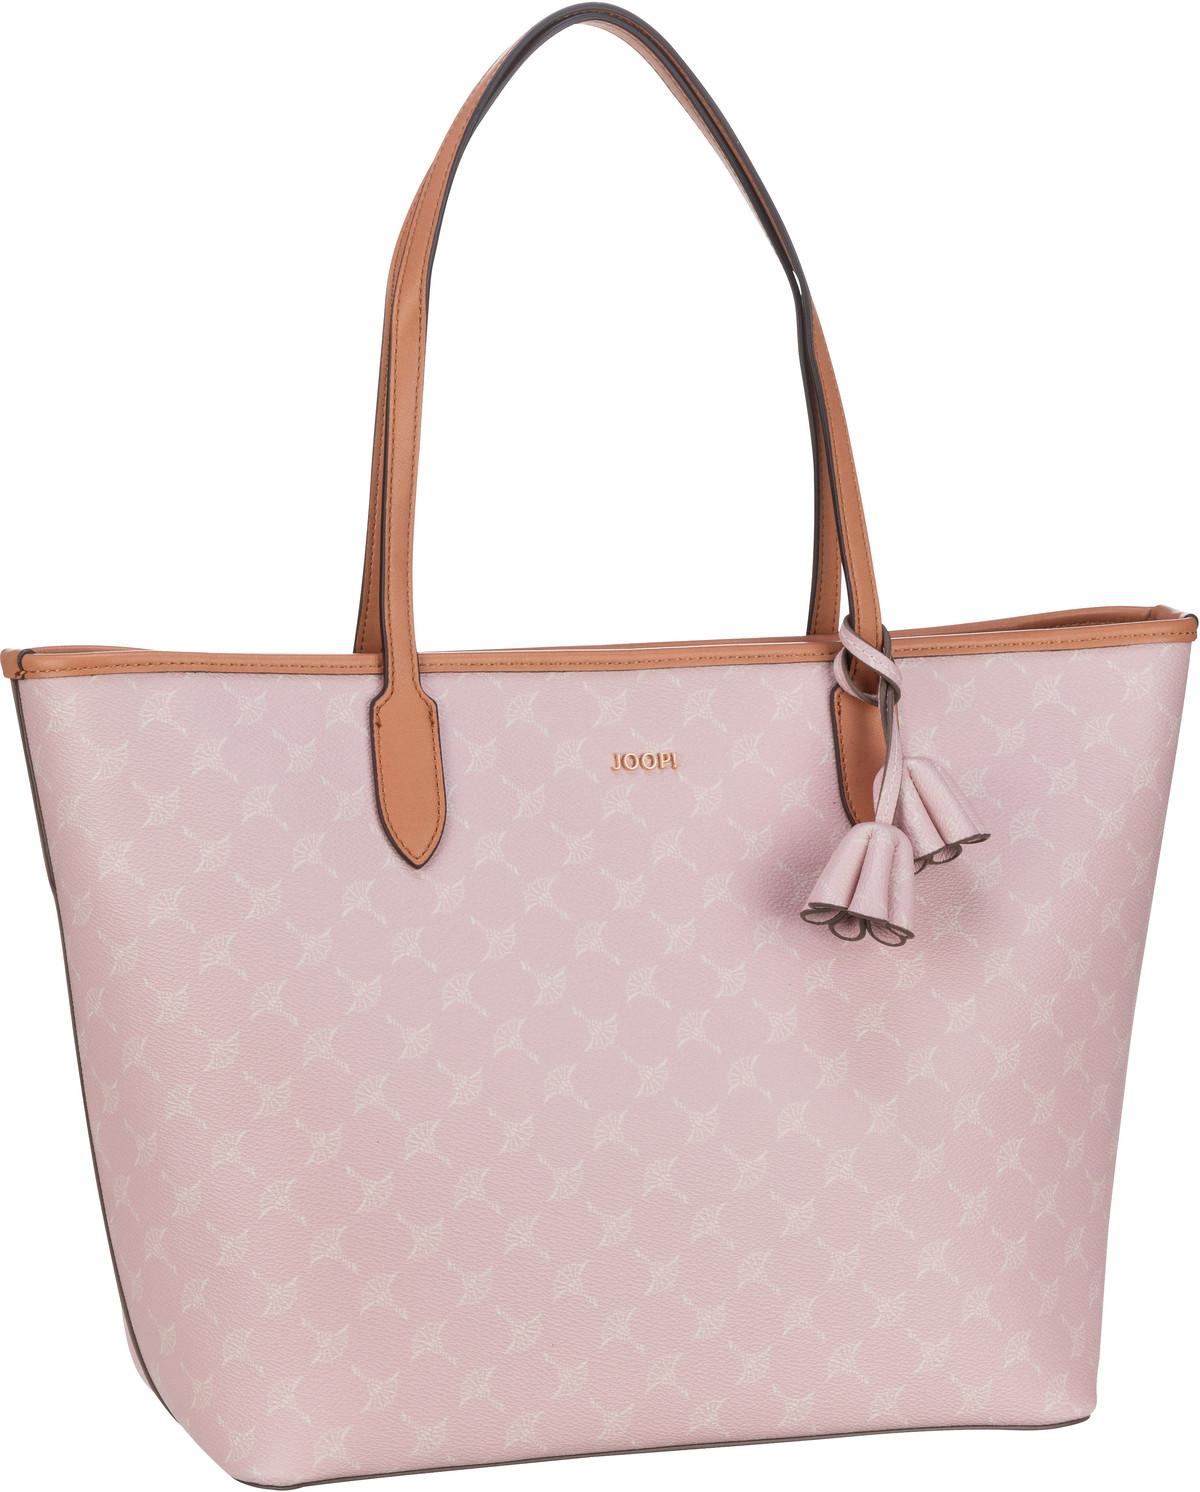 Handtasche Cortina Lara Shopper LHZ Rose